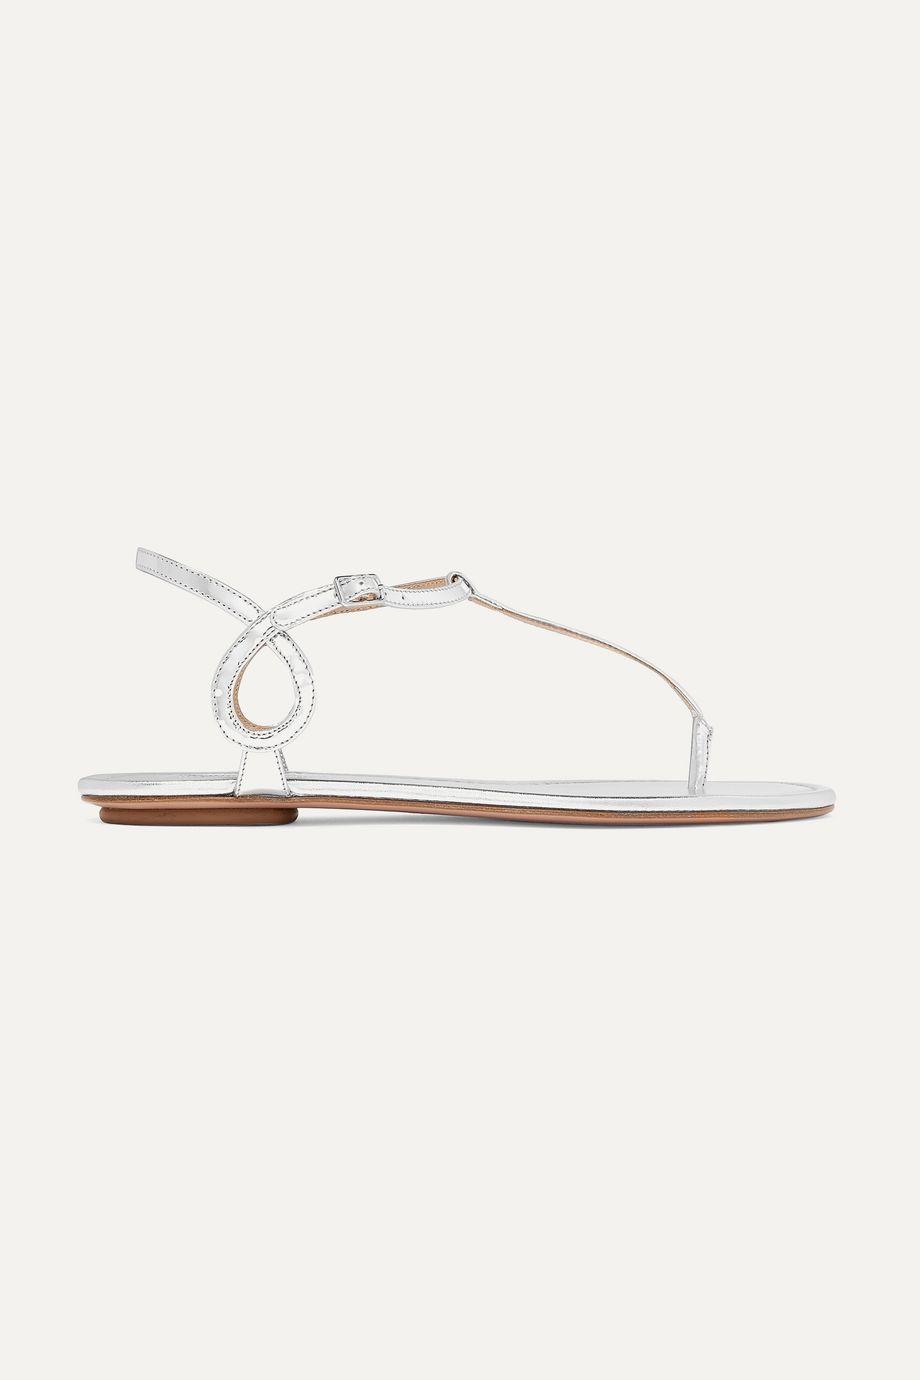 Aquazzura Almost Bare metallic leather sandals